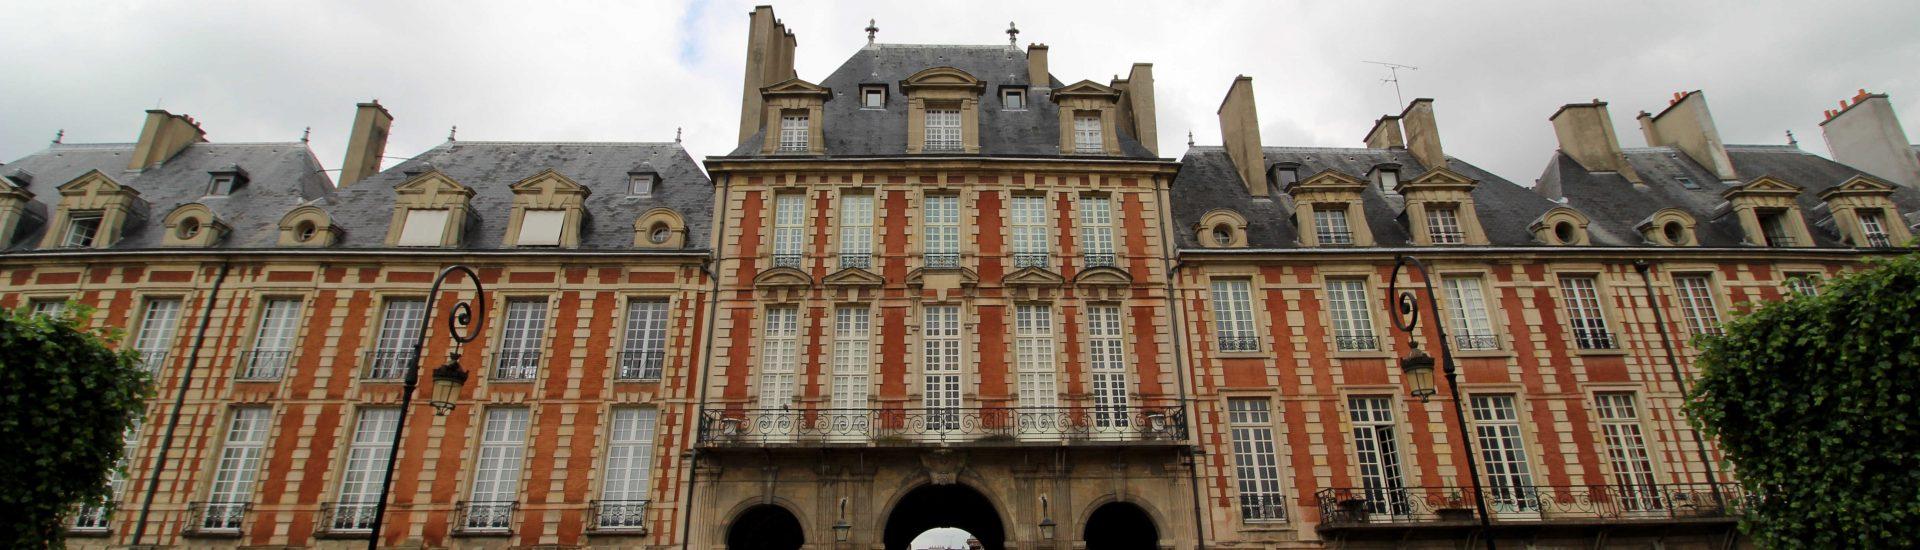 Sitios históricos París